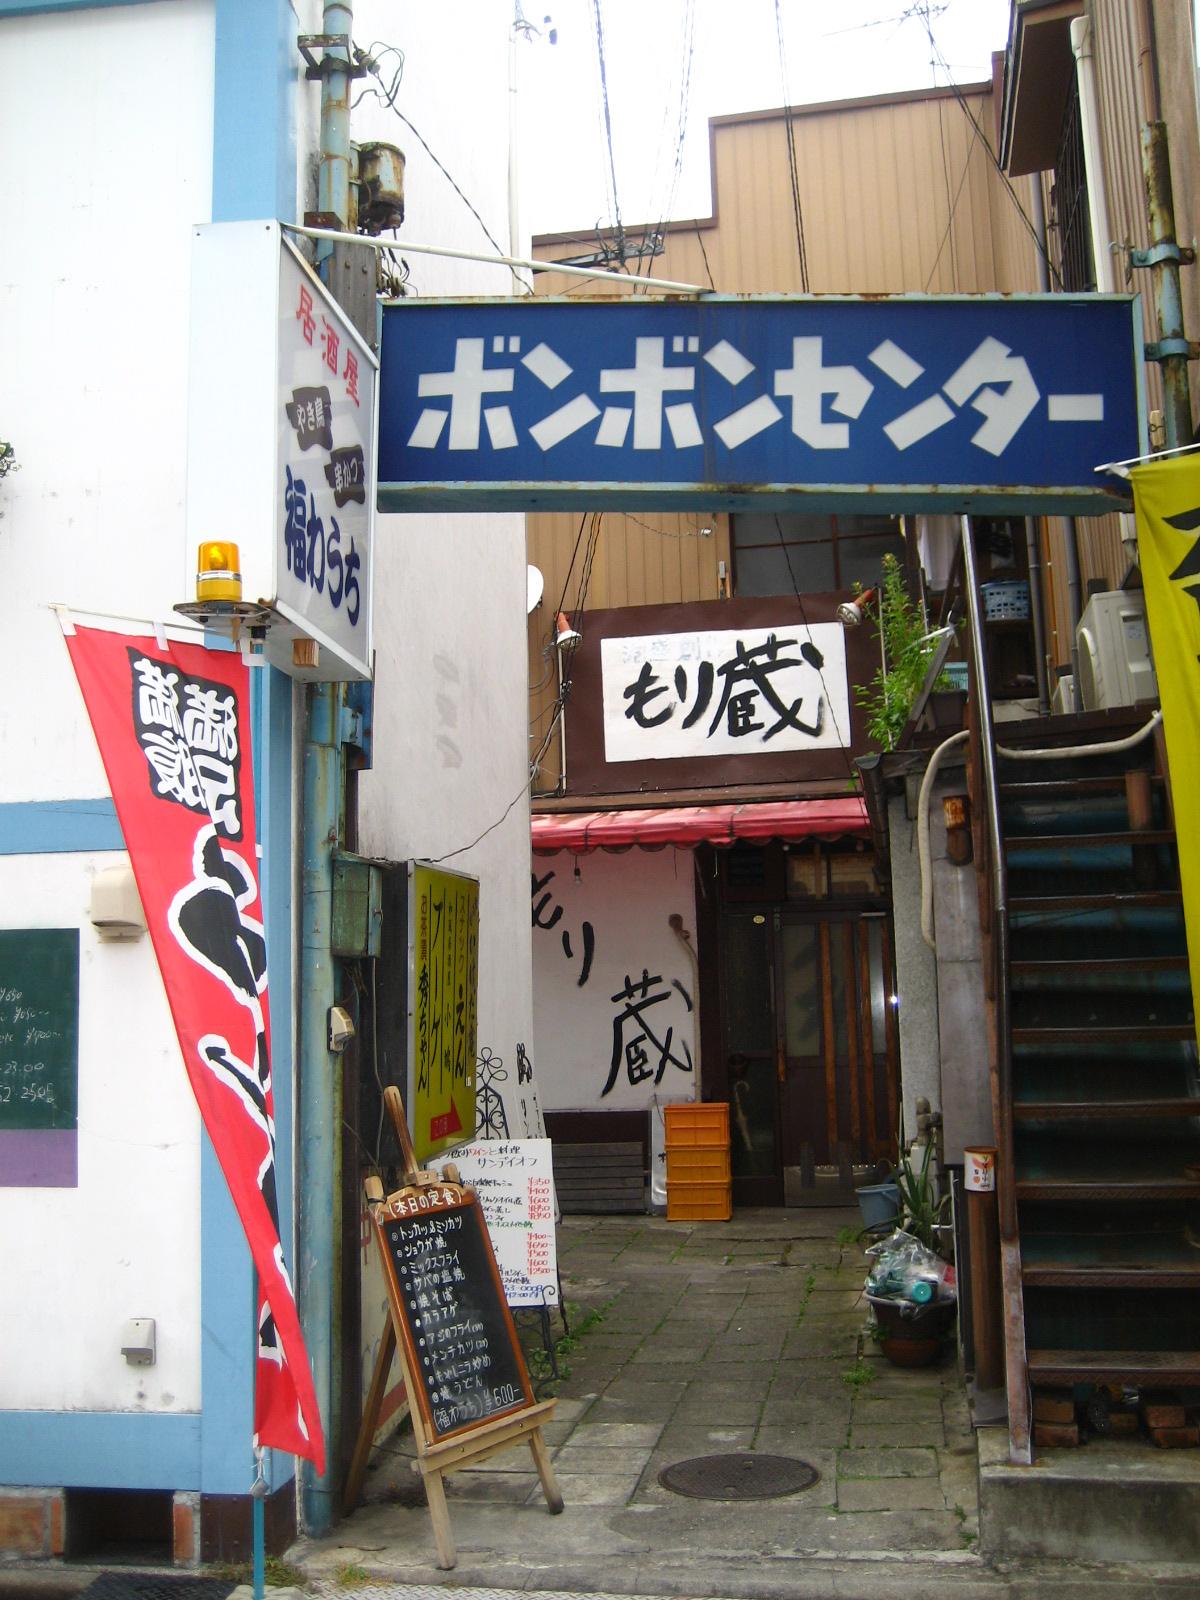 桜山、瑞穂・昭和区、名古屋の発信情報:居酒屋「福わうち ...